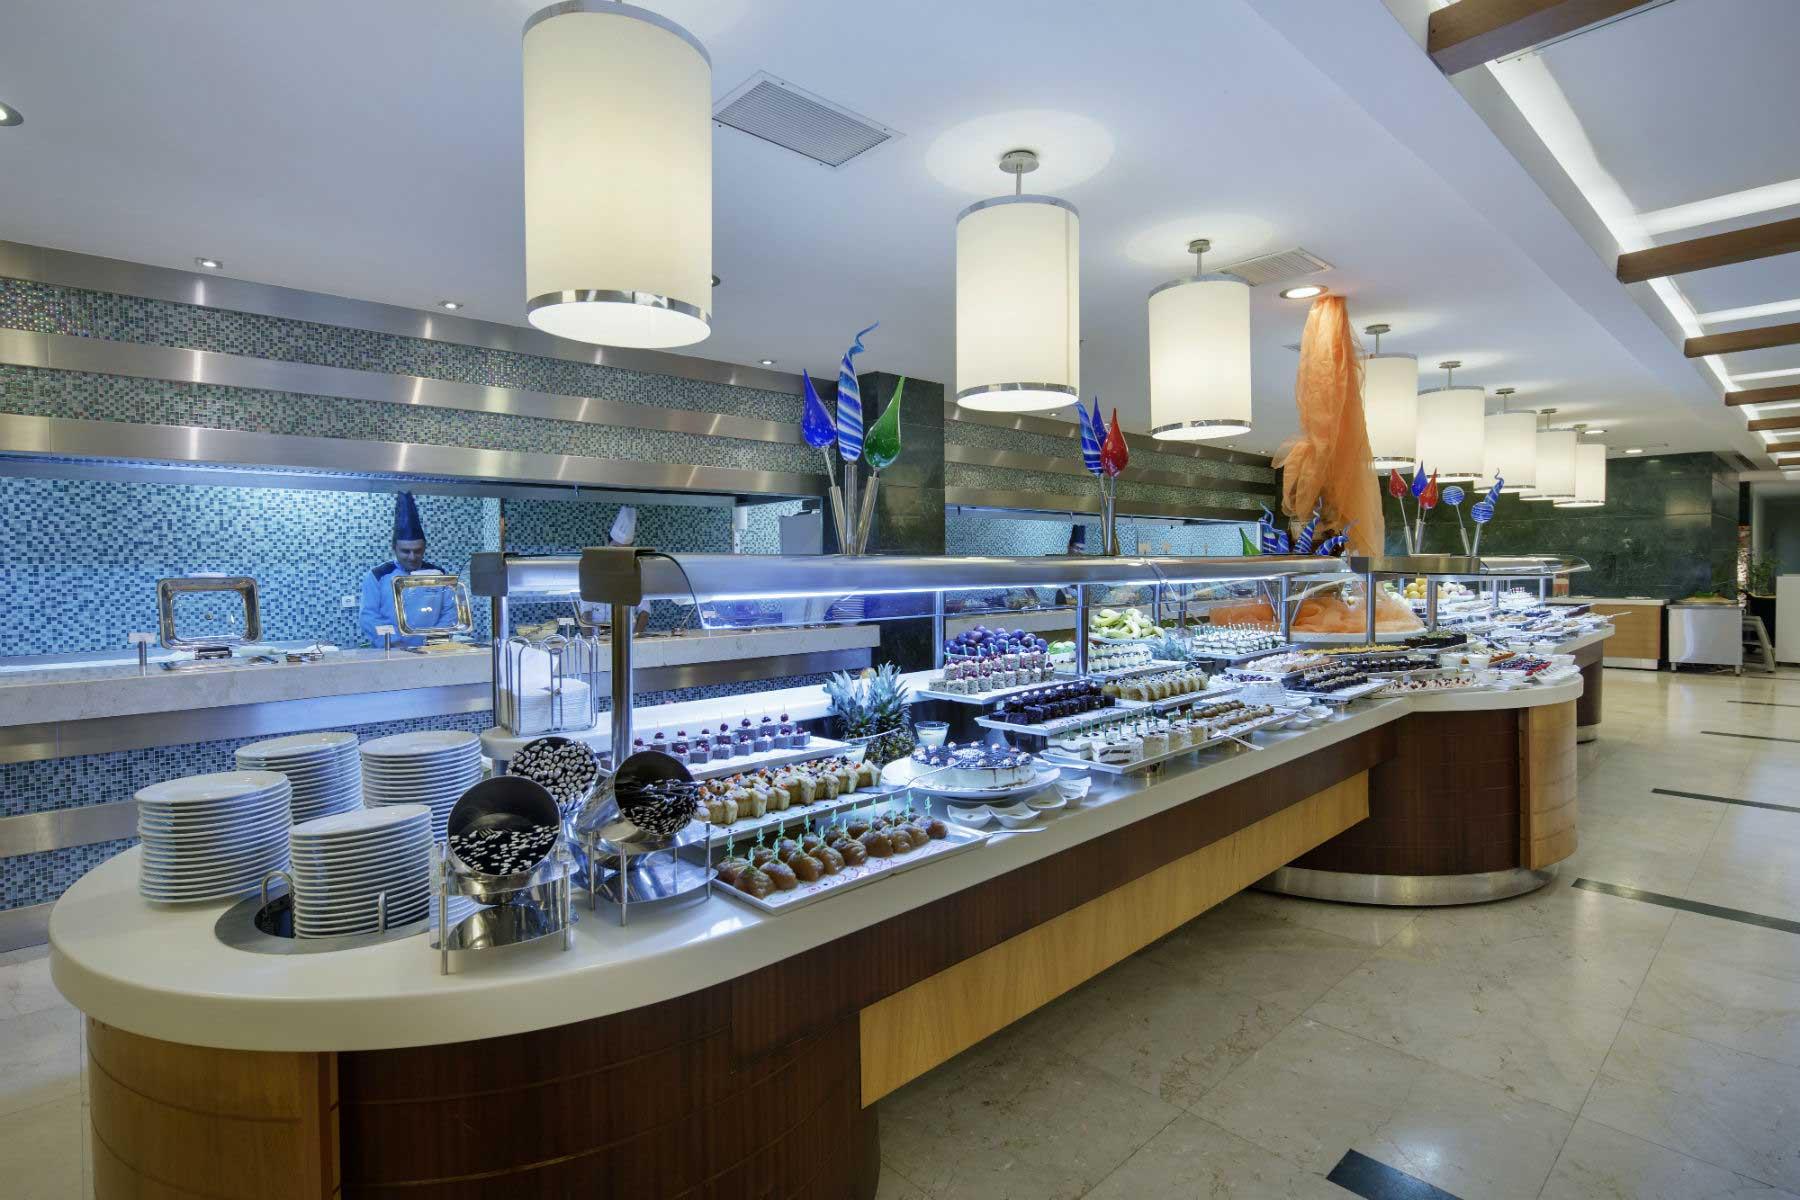 The Xanthe Resort & Spa restaurant